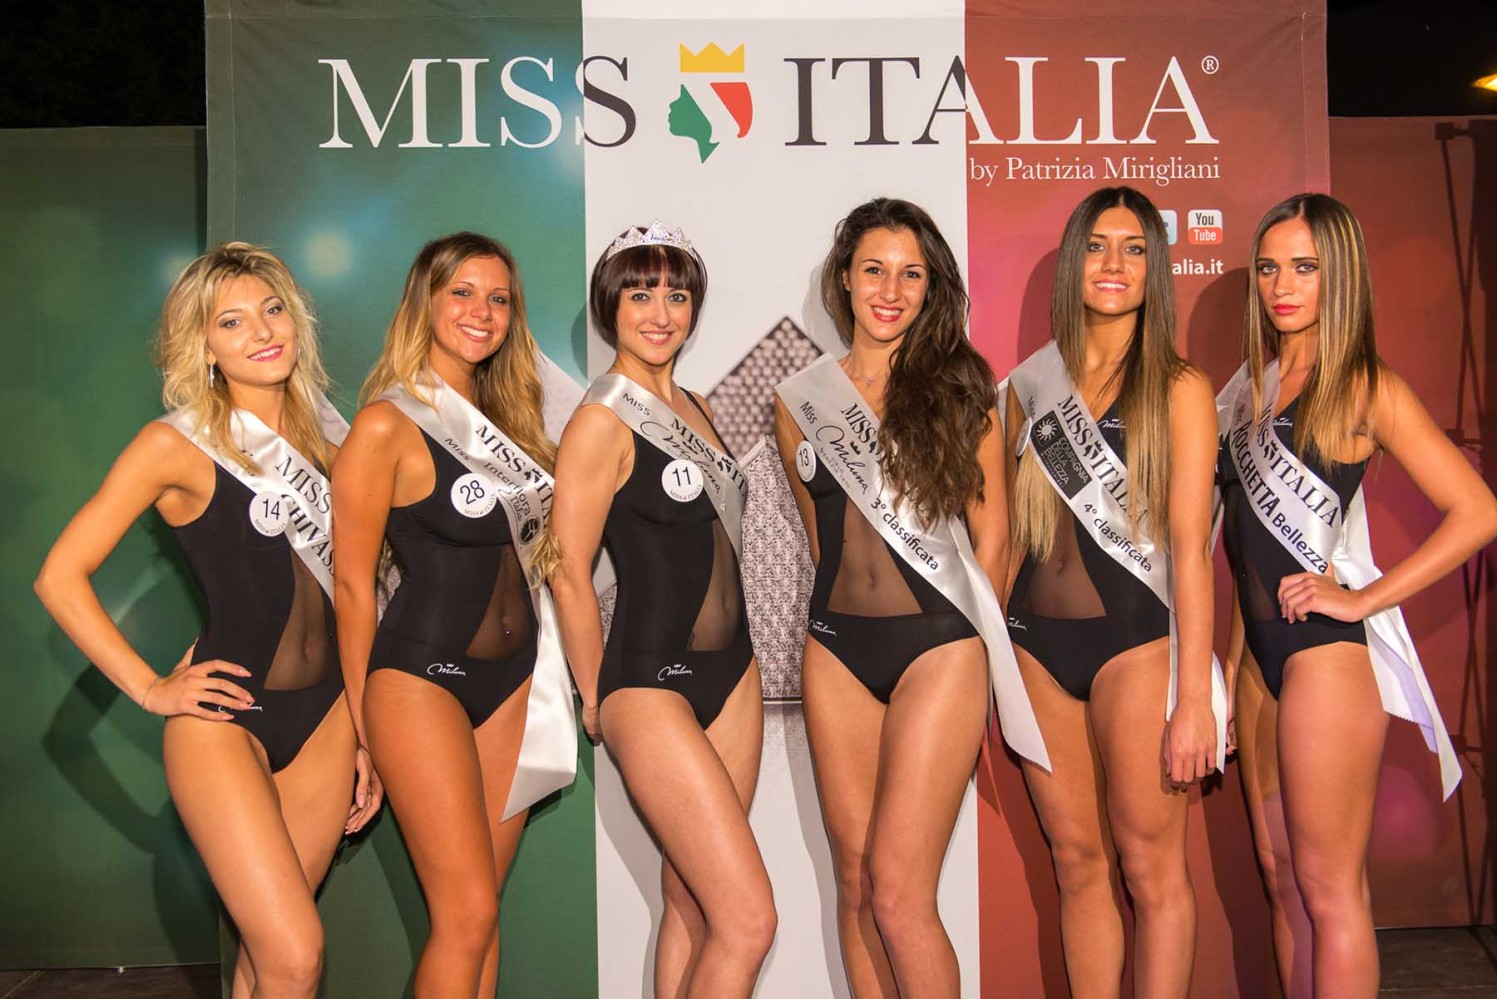 Veronica Bernasconi, Angelica Musazzo, Elisa Liistro, Federica Seglie, Sarah D'Agostino, Noemi Grosso